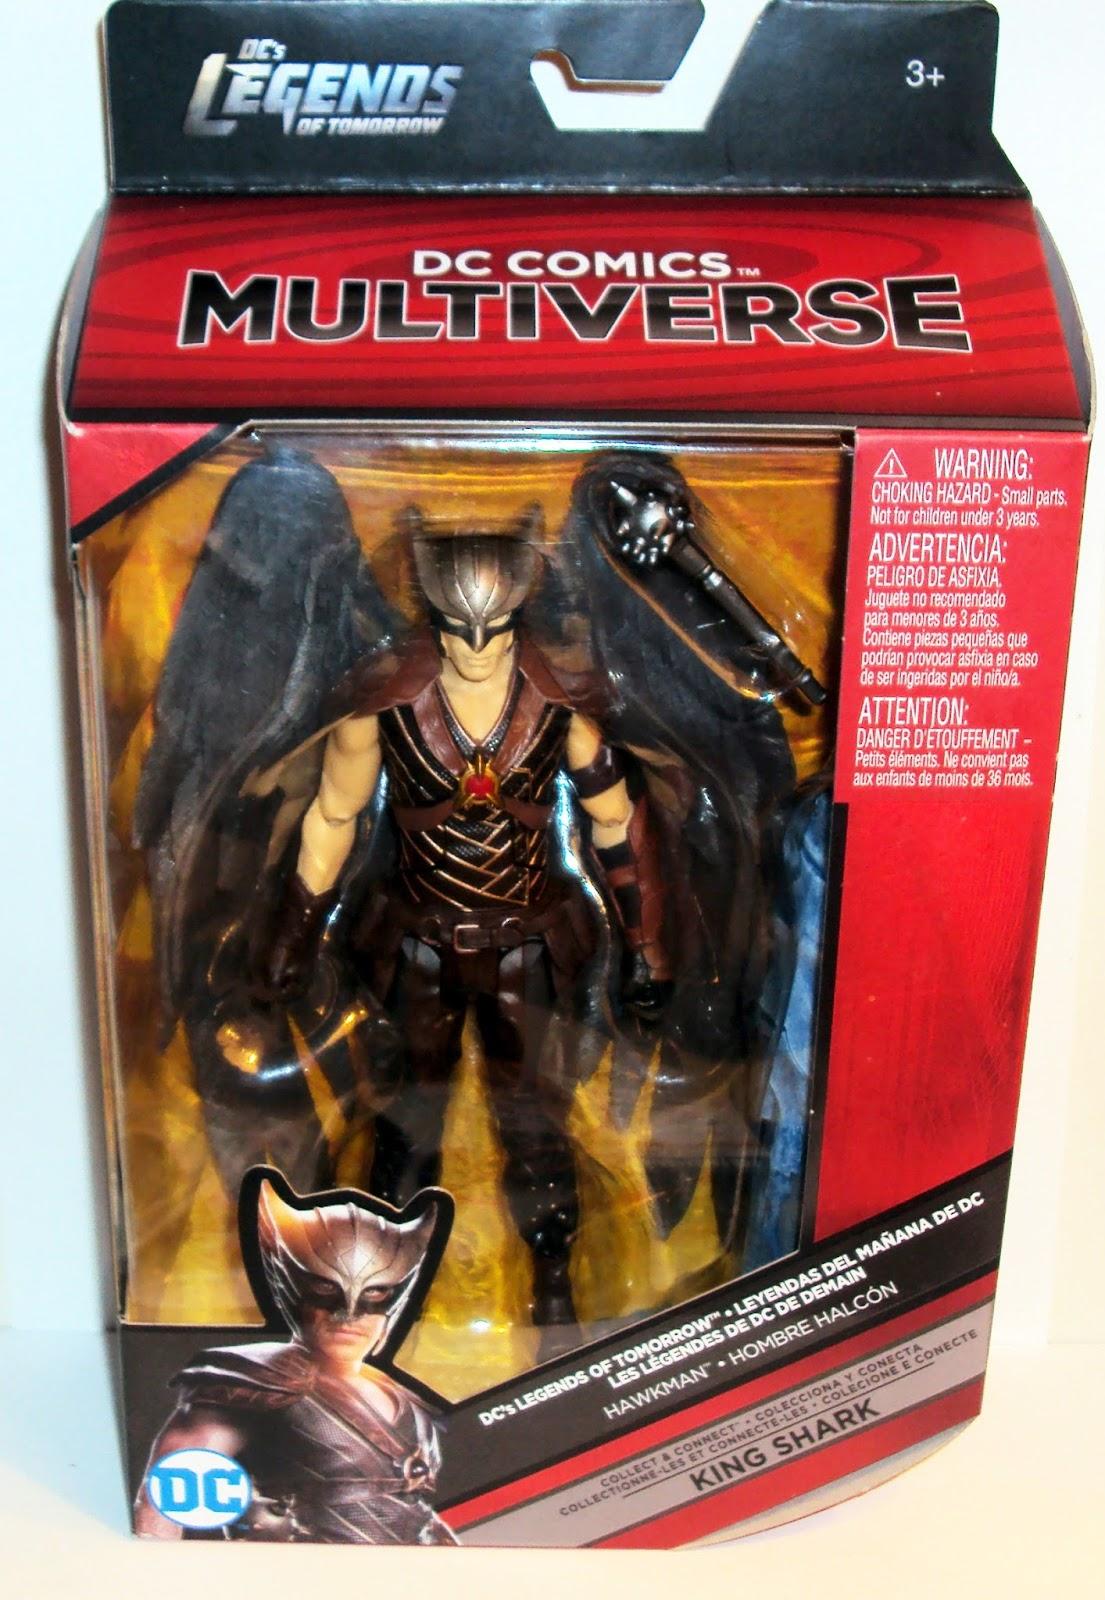 HawkMan DC Comics Multiverse King Shark Series Legends of Tomorrow Action Figure